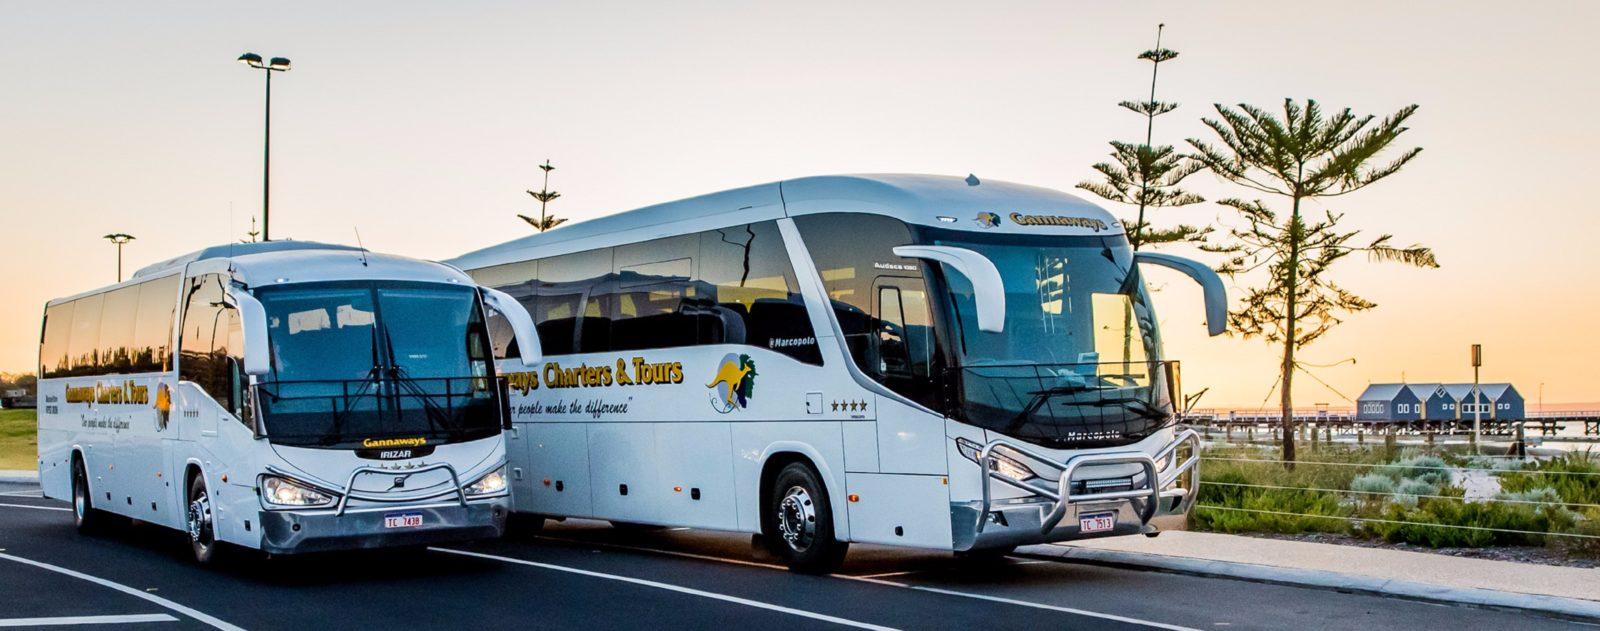 Gannaways Charters and Tours, Busselton, Western Australia